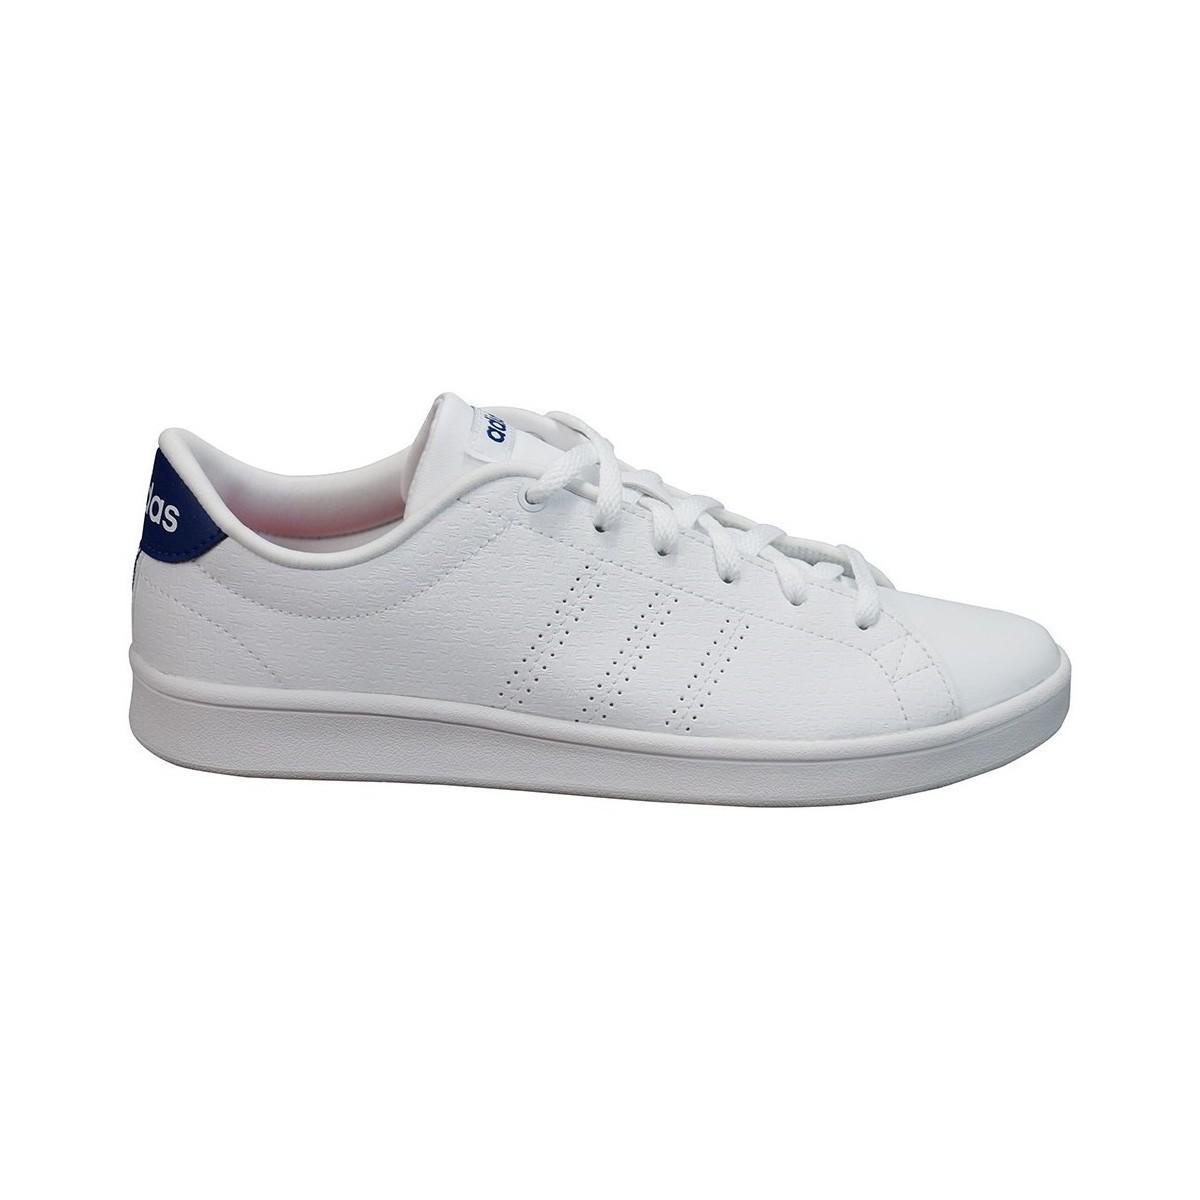 quality design e87fa 235e1 adidas Advantage Cl Qtw Womens Shoes (trainers) In White in